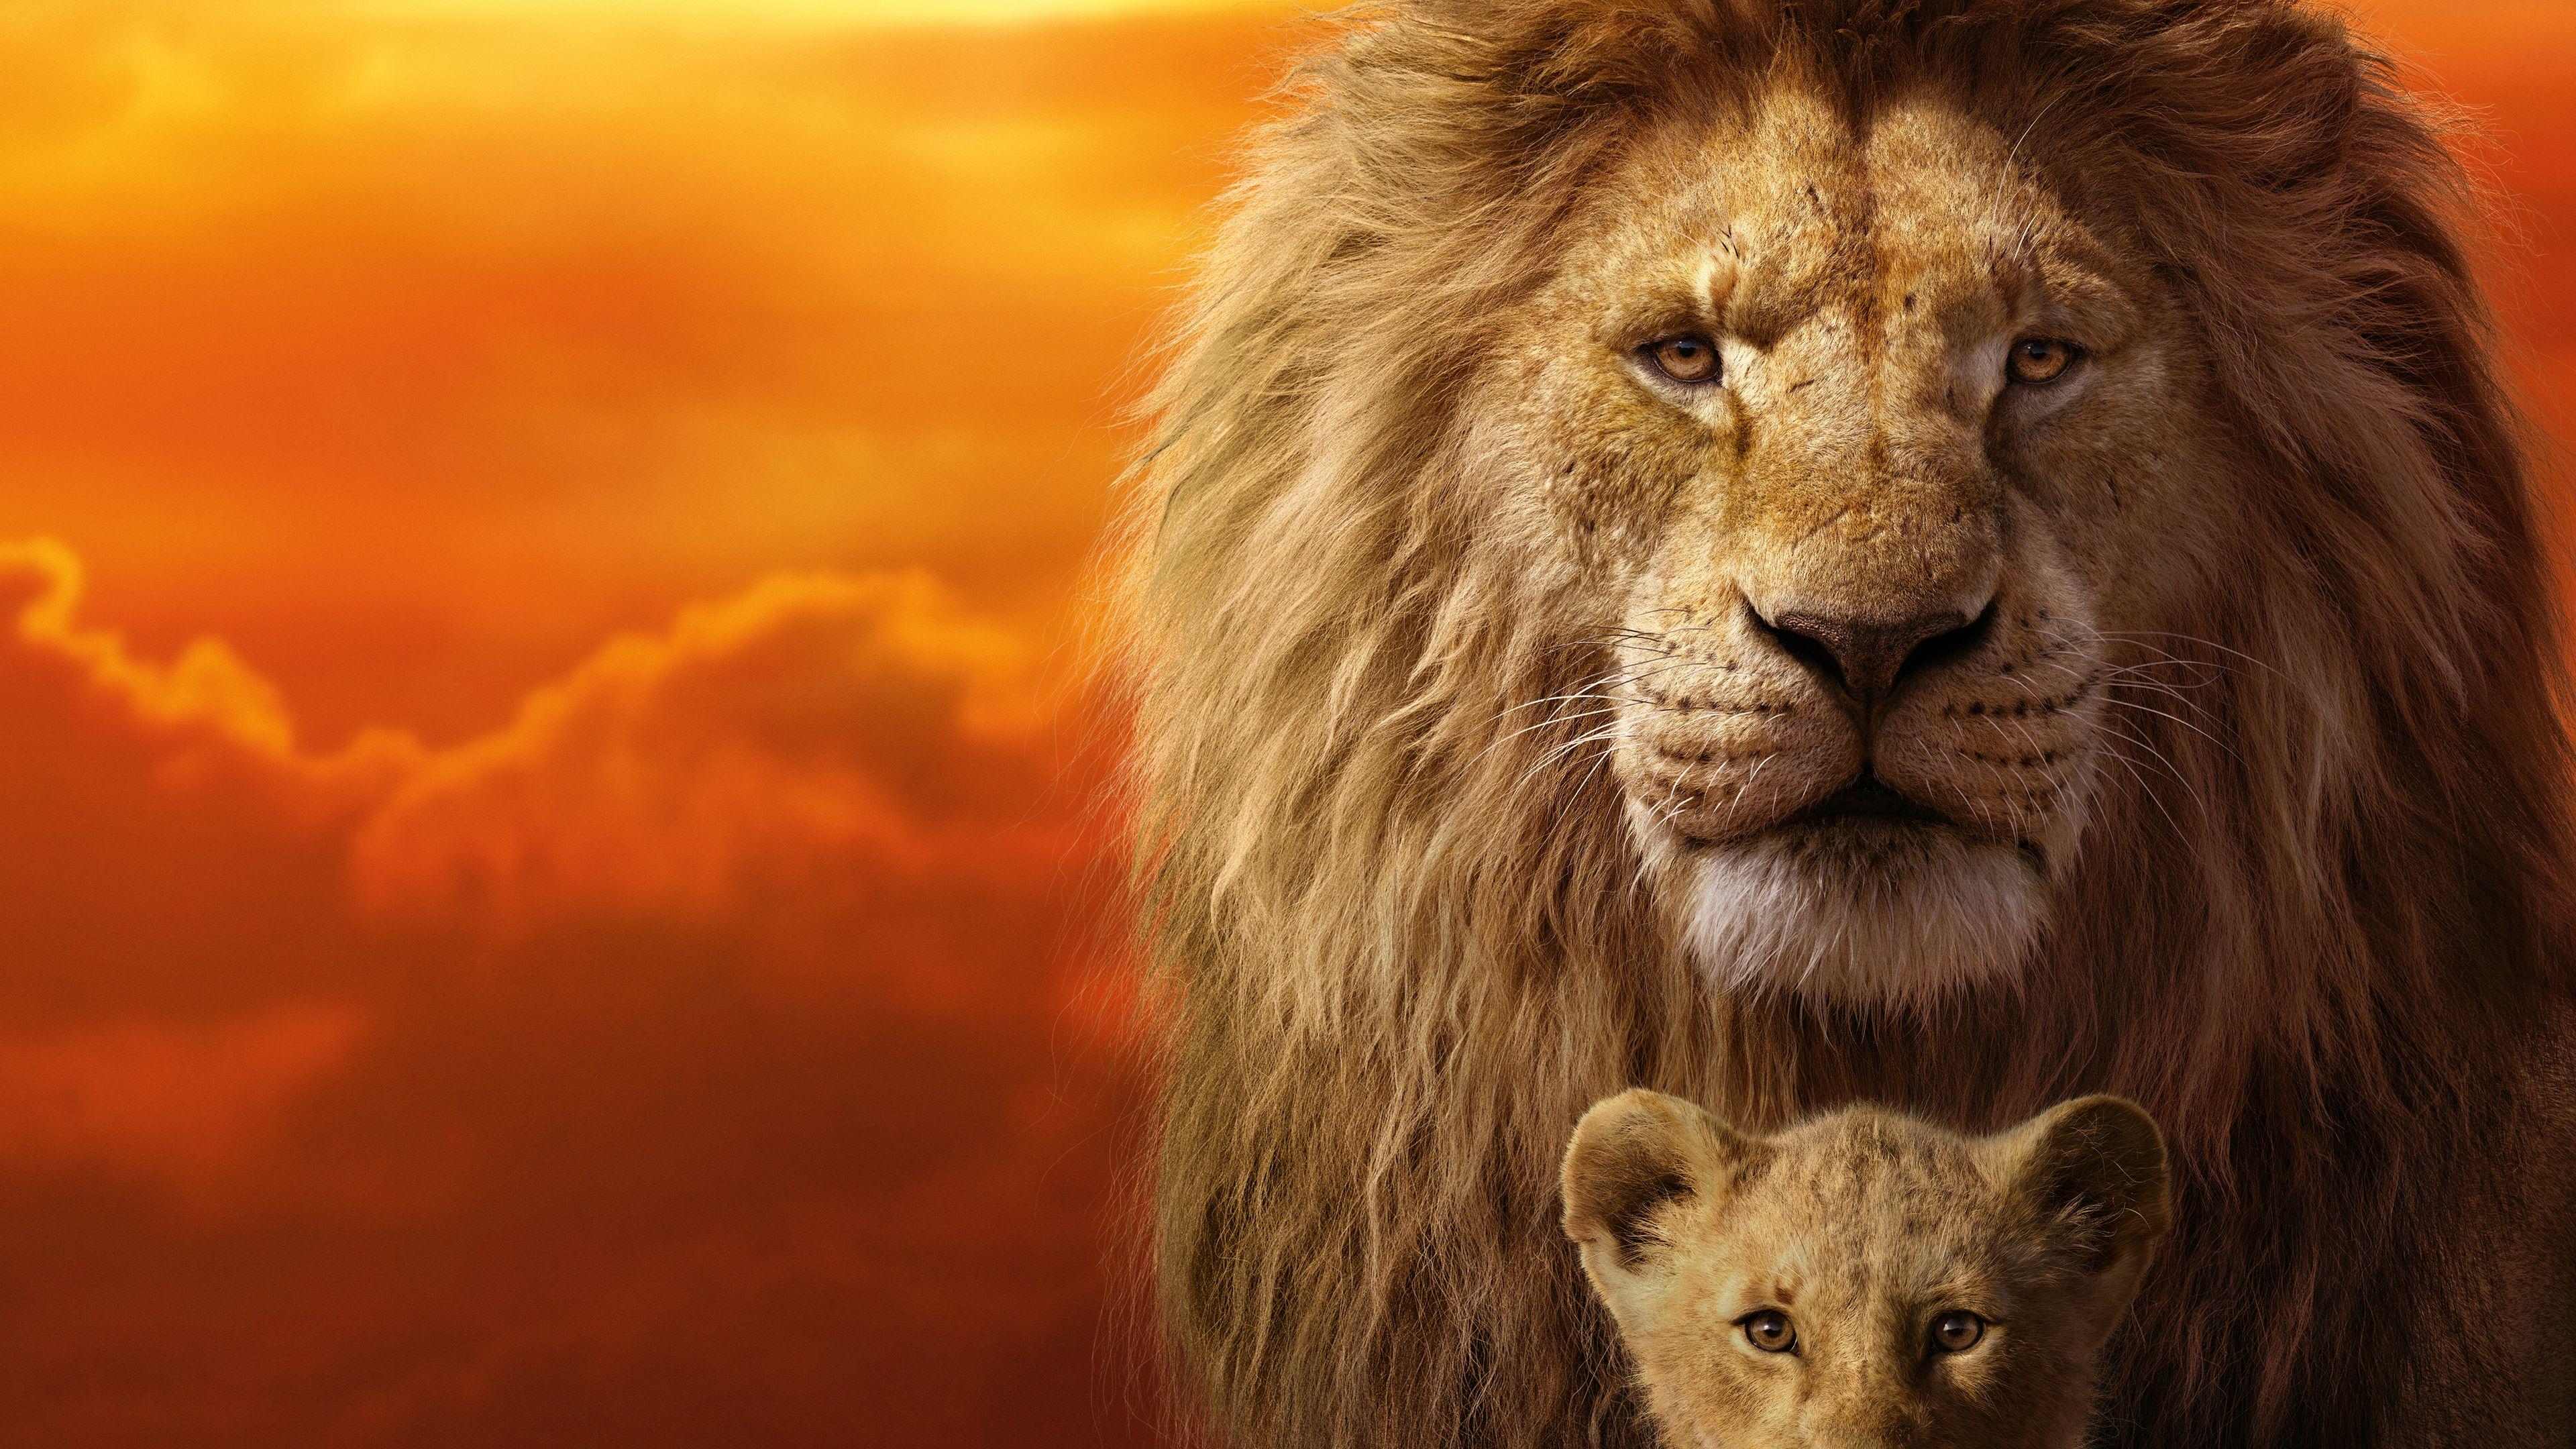 The Lion King The Lion King Wallpapers Simba Wallpapers Movies Wallpapers Lion Wallpapers Hd Wallpapers Disney Wa Lion King 2019 Lion King Movie Lion King